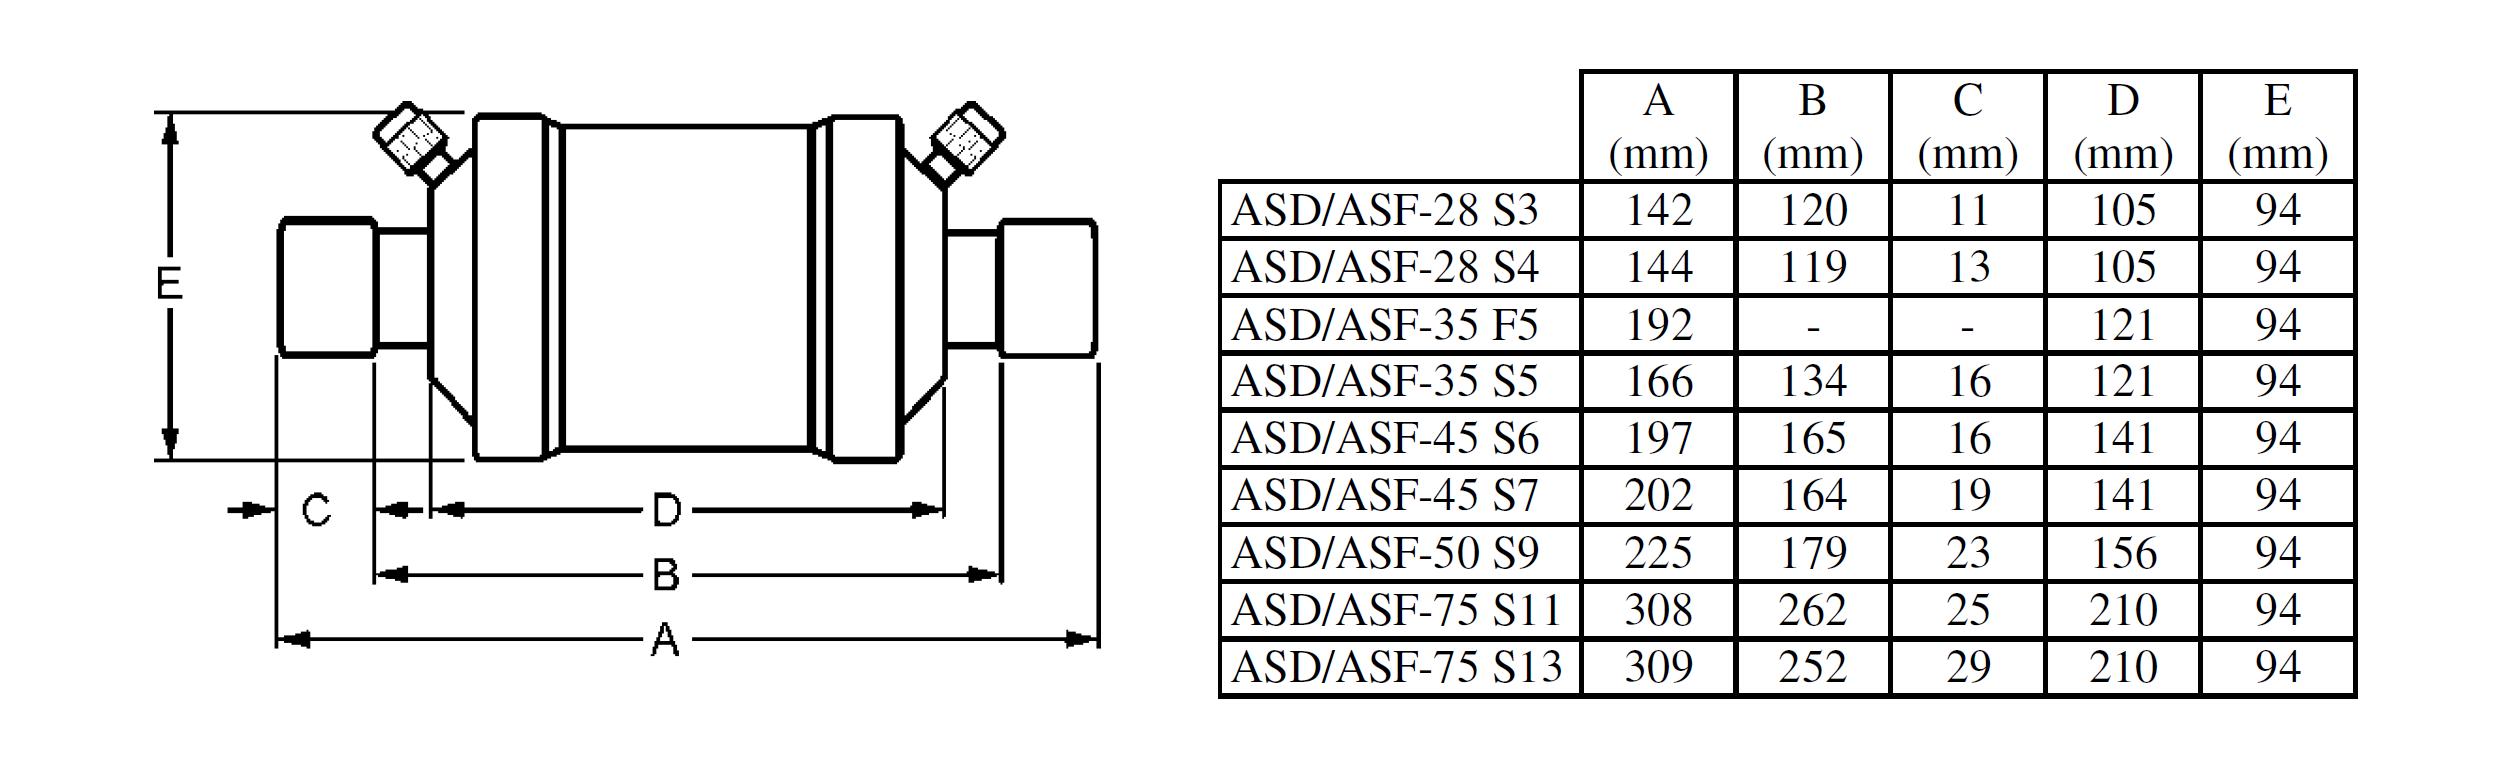 Фильтр на всасывание Alco Controls ASF-50 S9 - фото 2